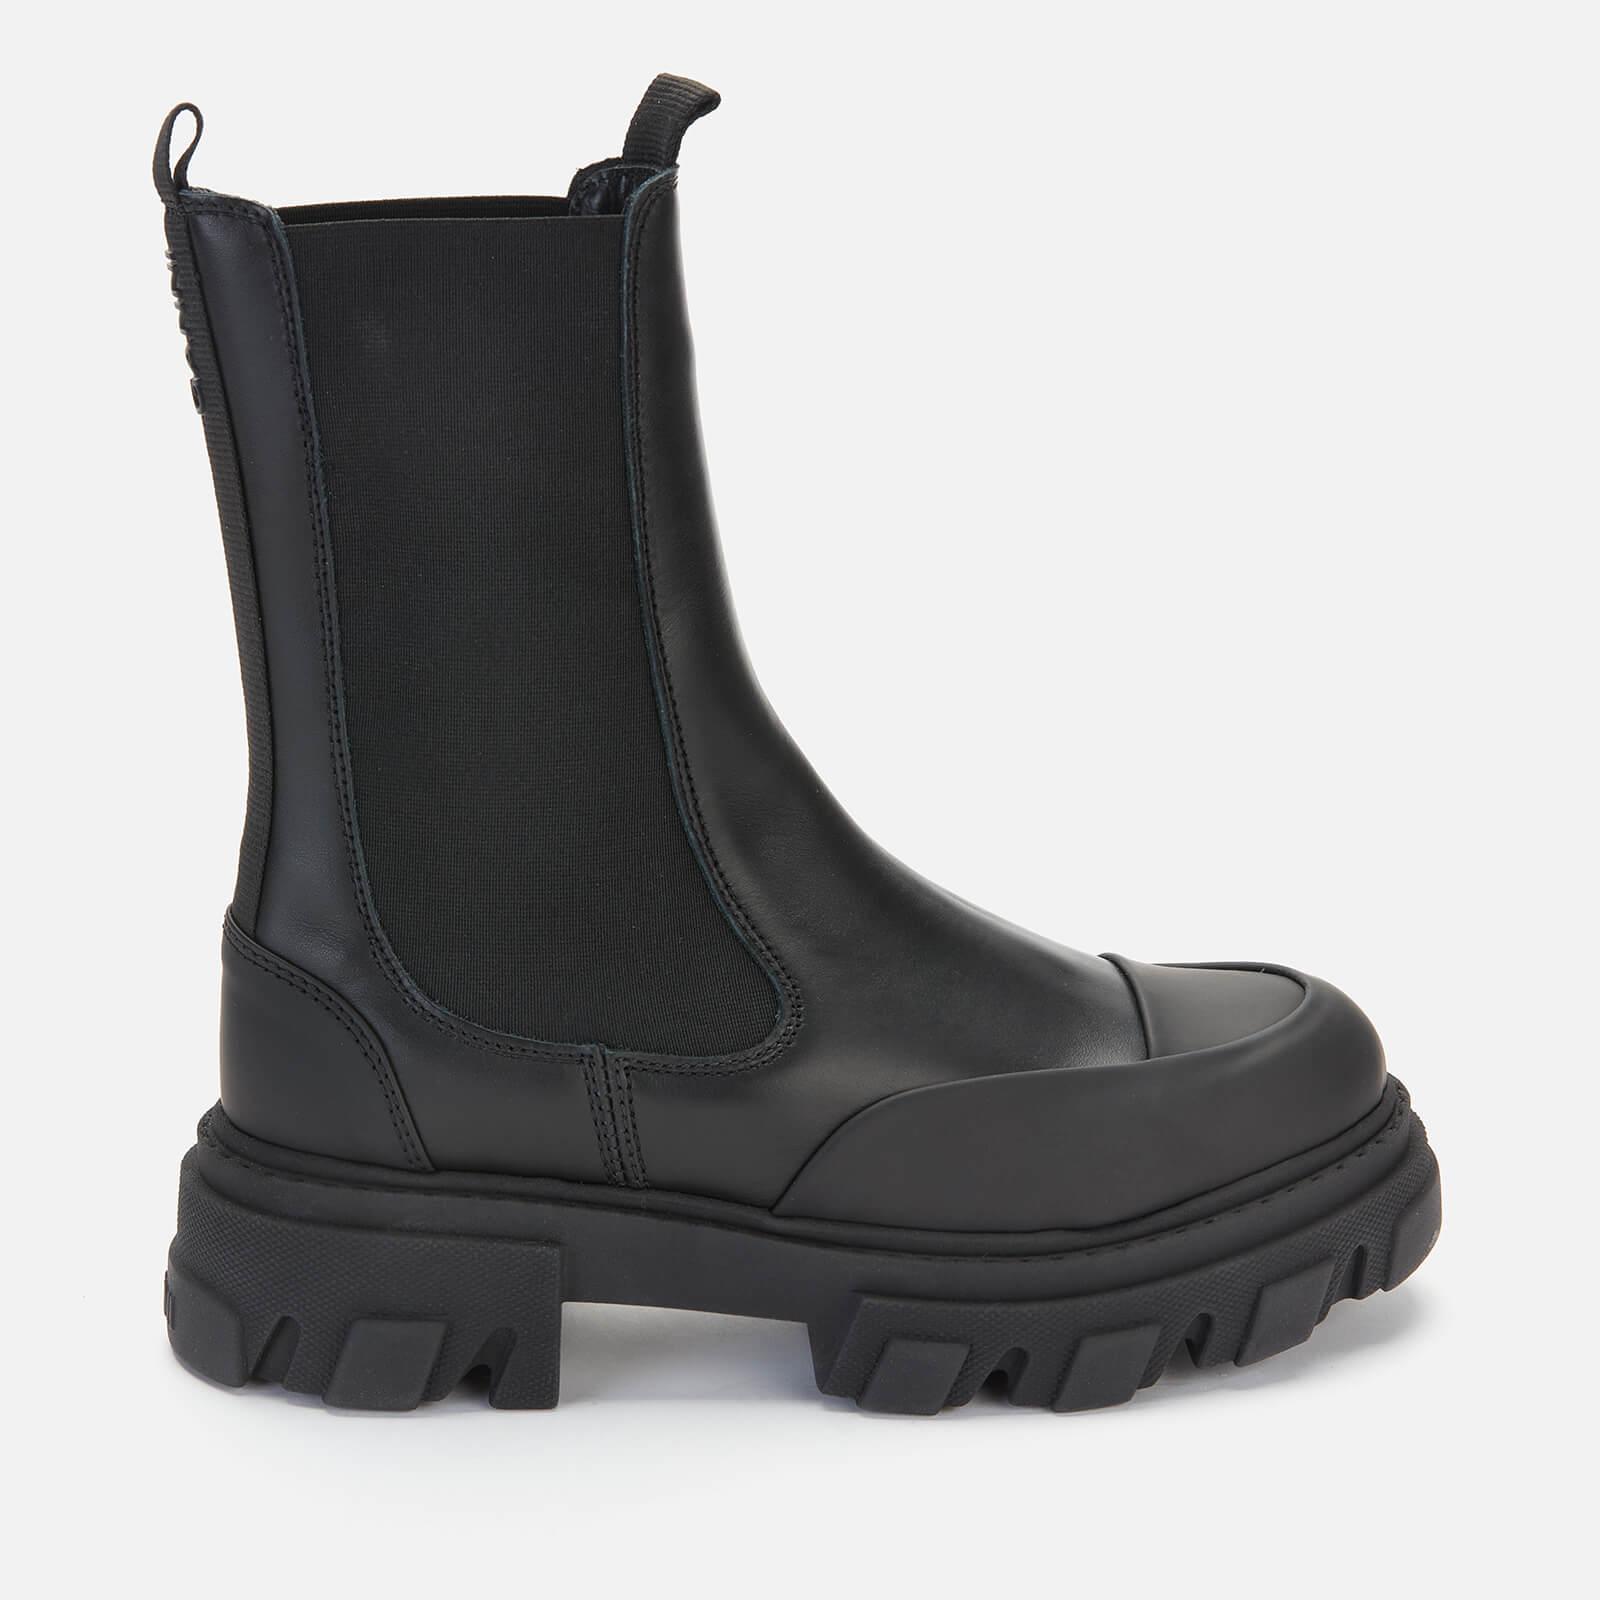 Ganni Women's Mid Leather Chelsea Boots - Black - Uk 8